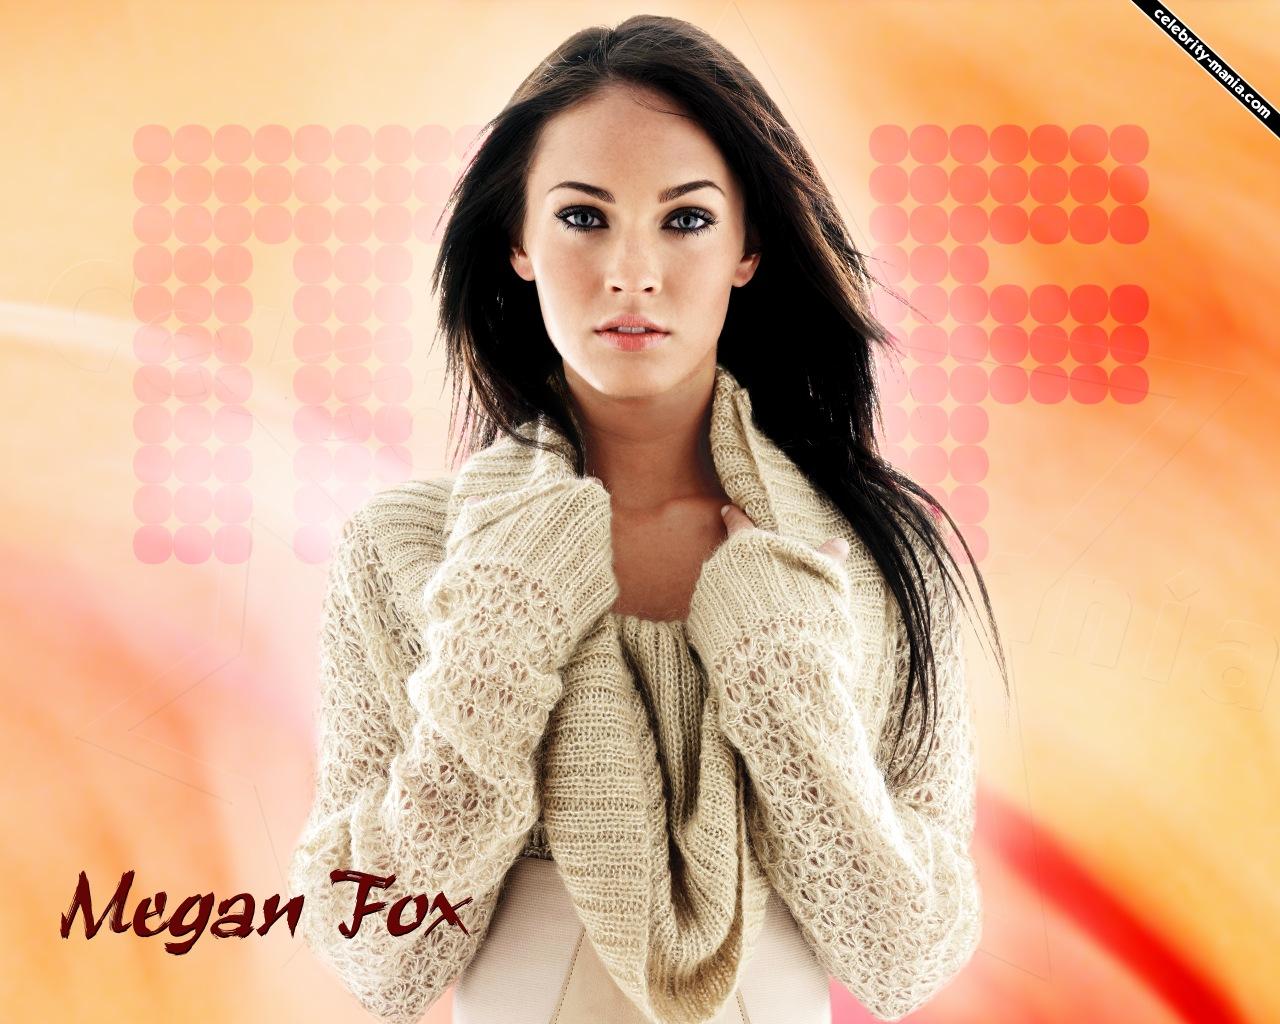 http://4.bp.blogspot.com/-y1HVC-324-E/Tc-ZISRt7uI/AAAAAAAAOG0/2syQ5lJ0Gck/s1600/megan_fox.jpg